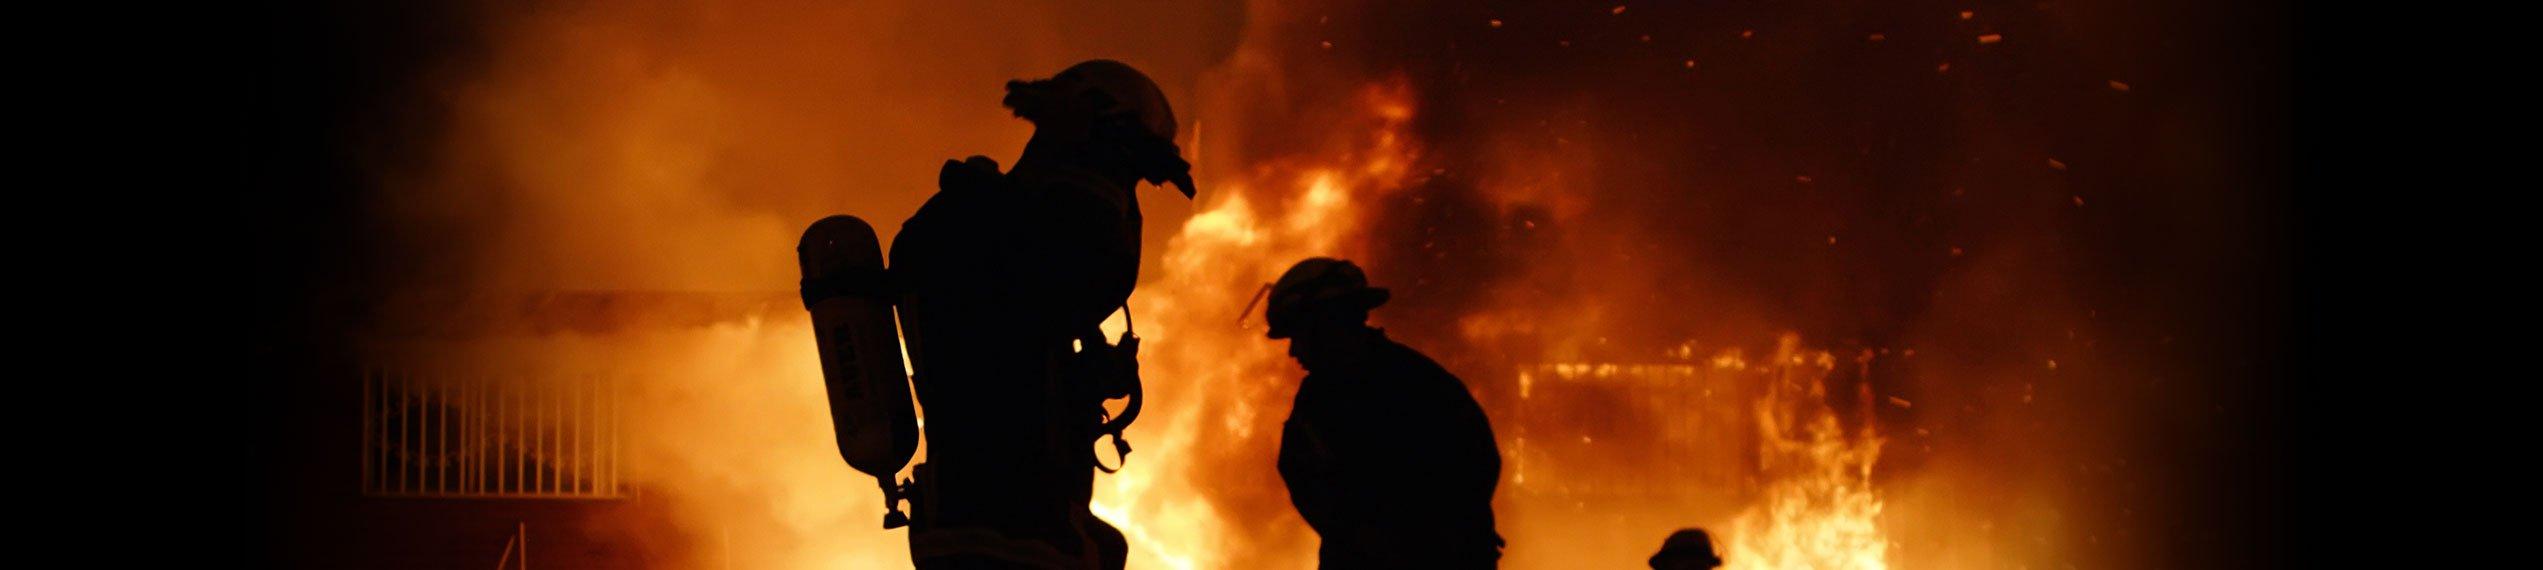 Fire & Smoke Damage Removal in Paul Davis Restoration & Remodeling of Southwest Missouri